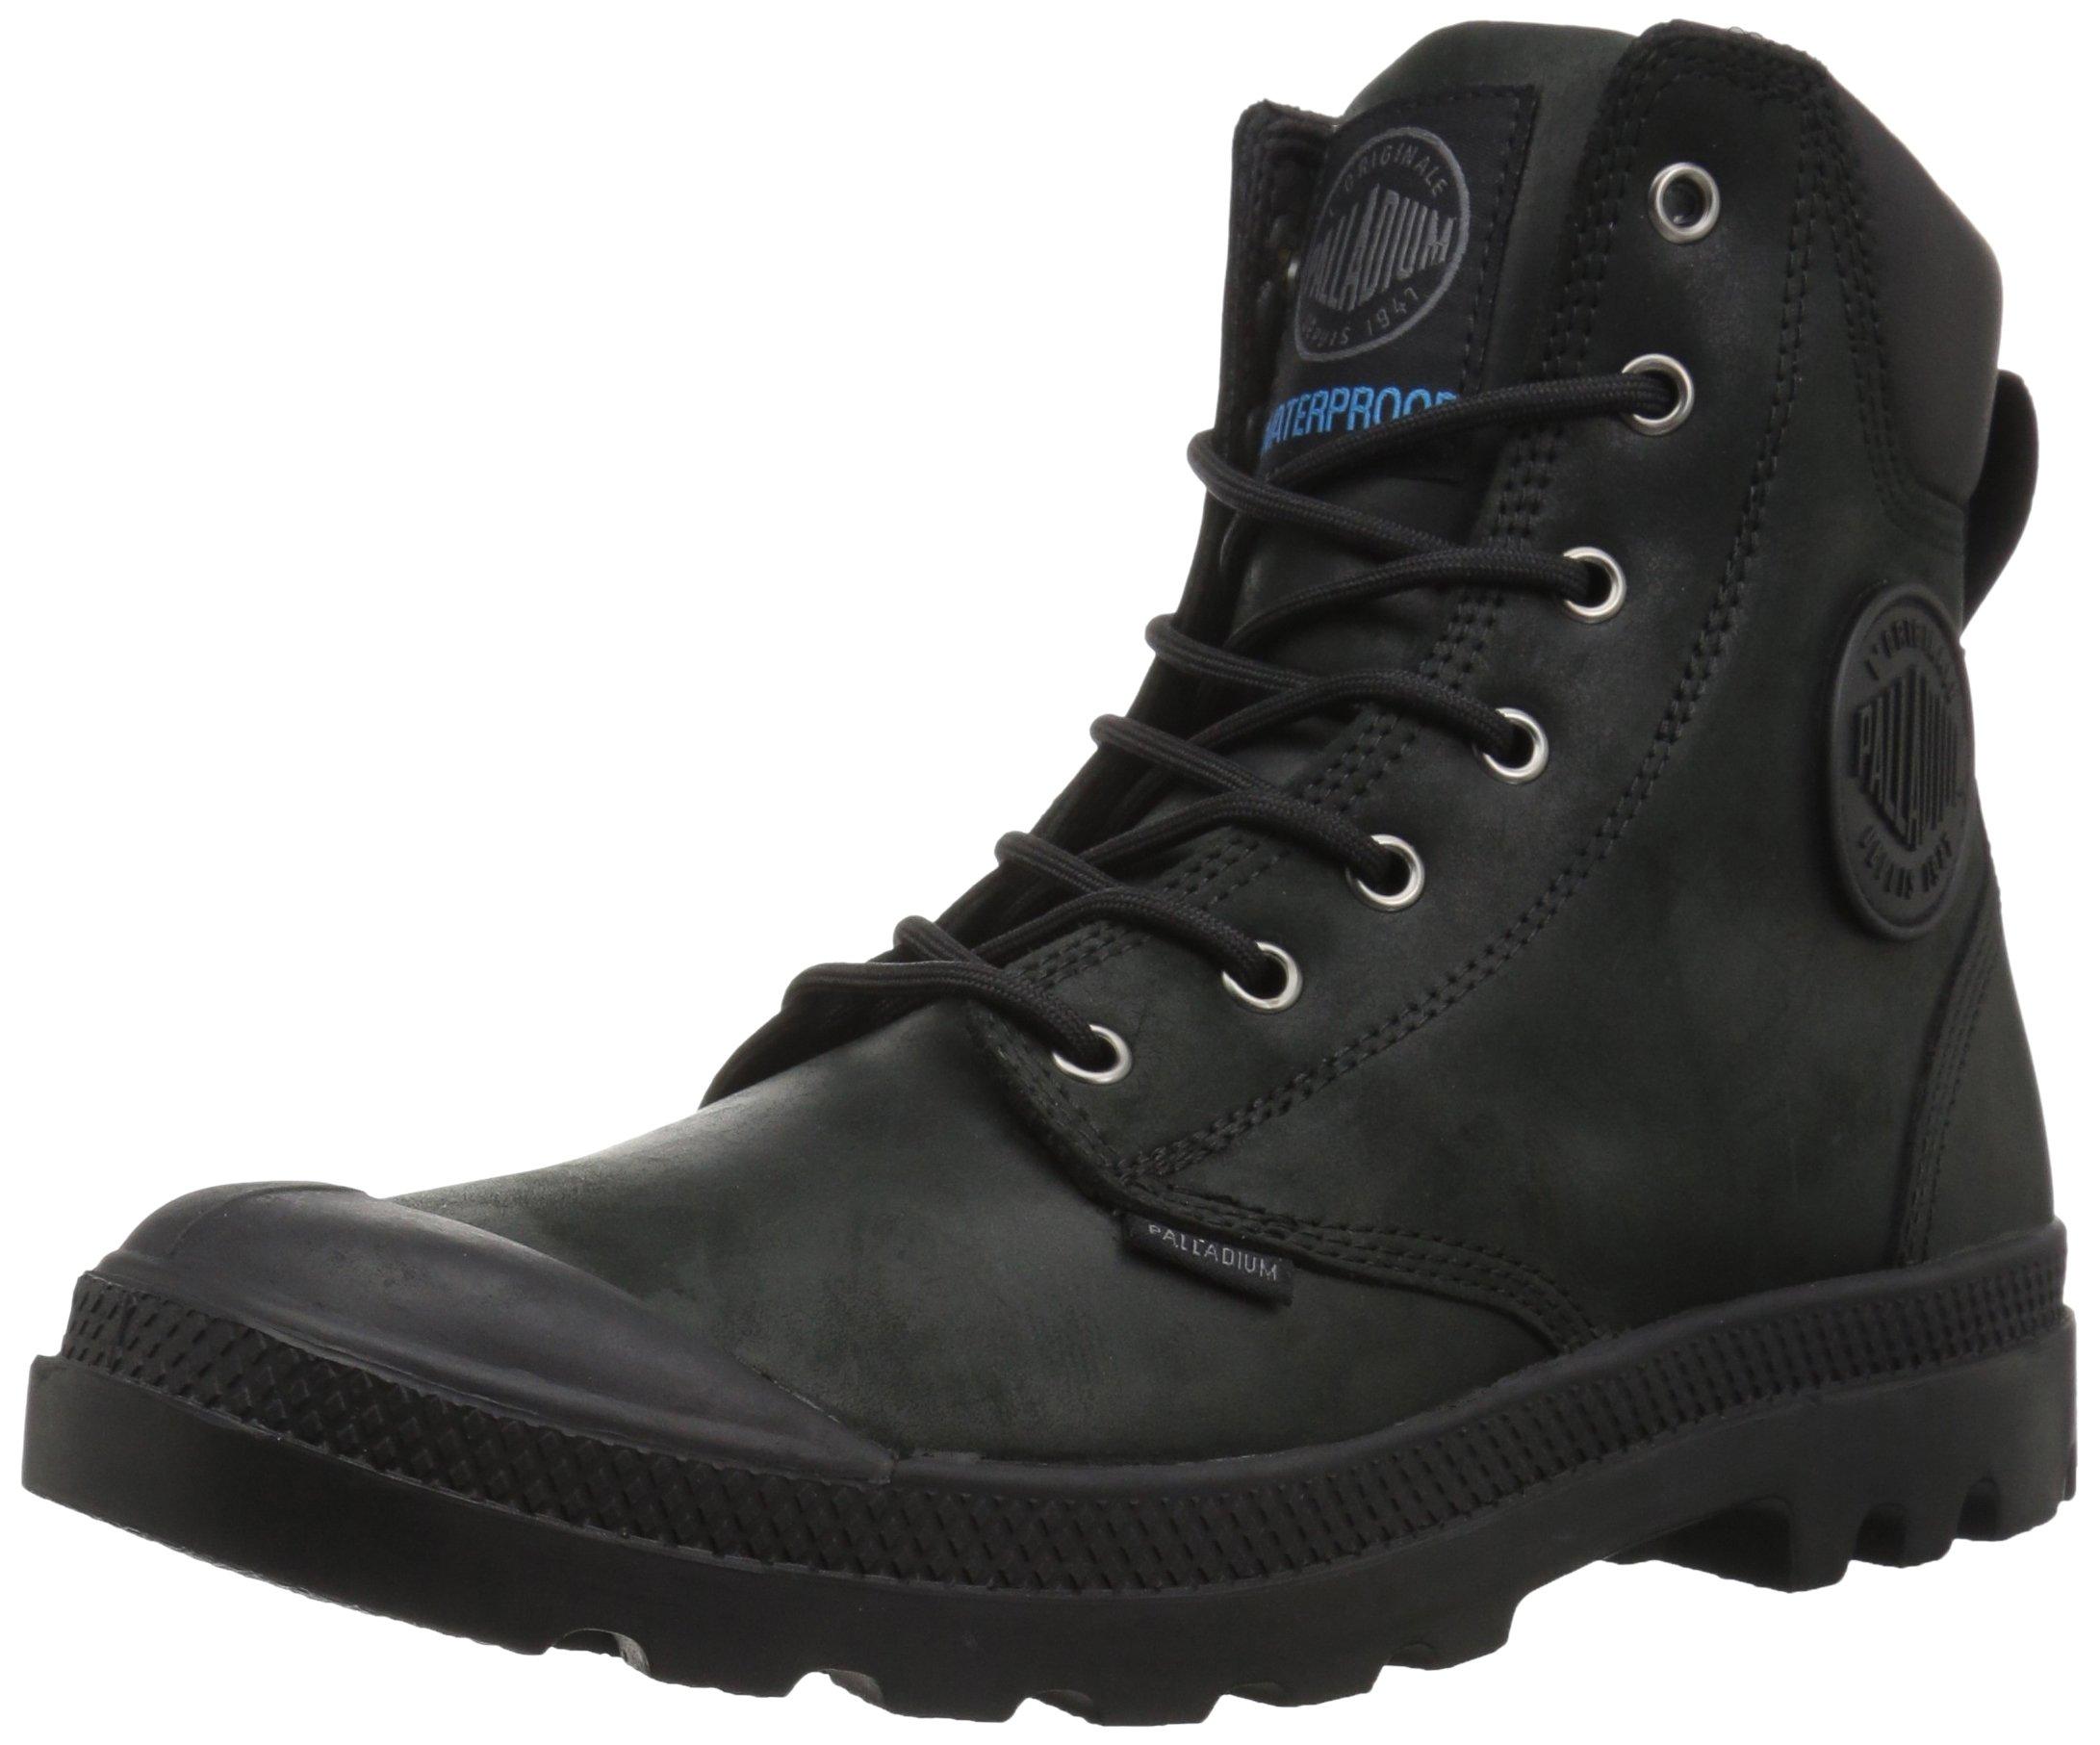 Palladium Men's Pampa Cuff WP Lux Rain Boot, Black, 12 M US